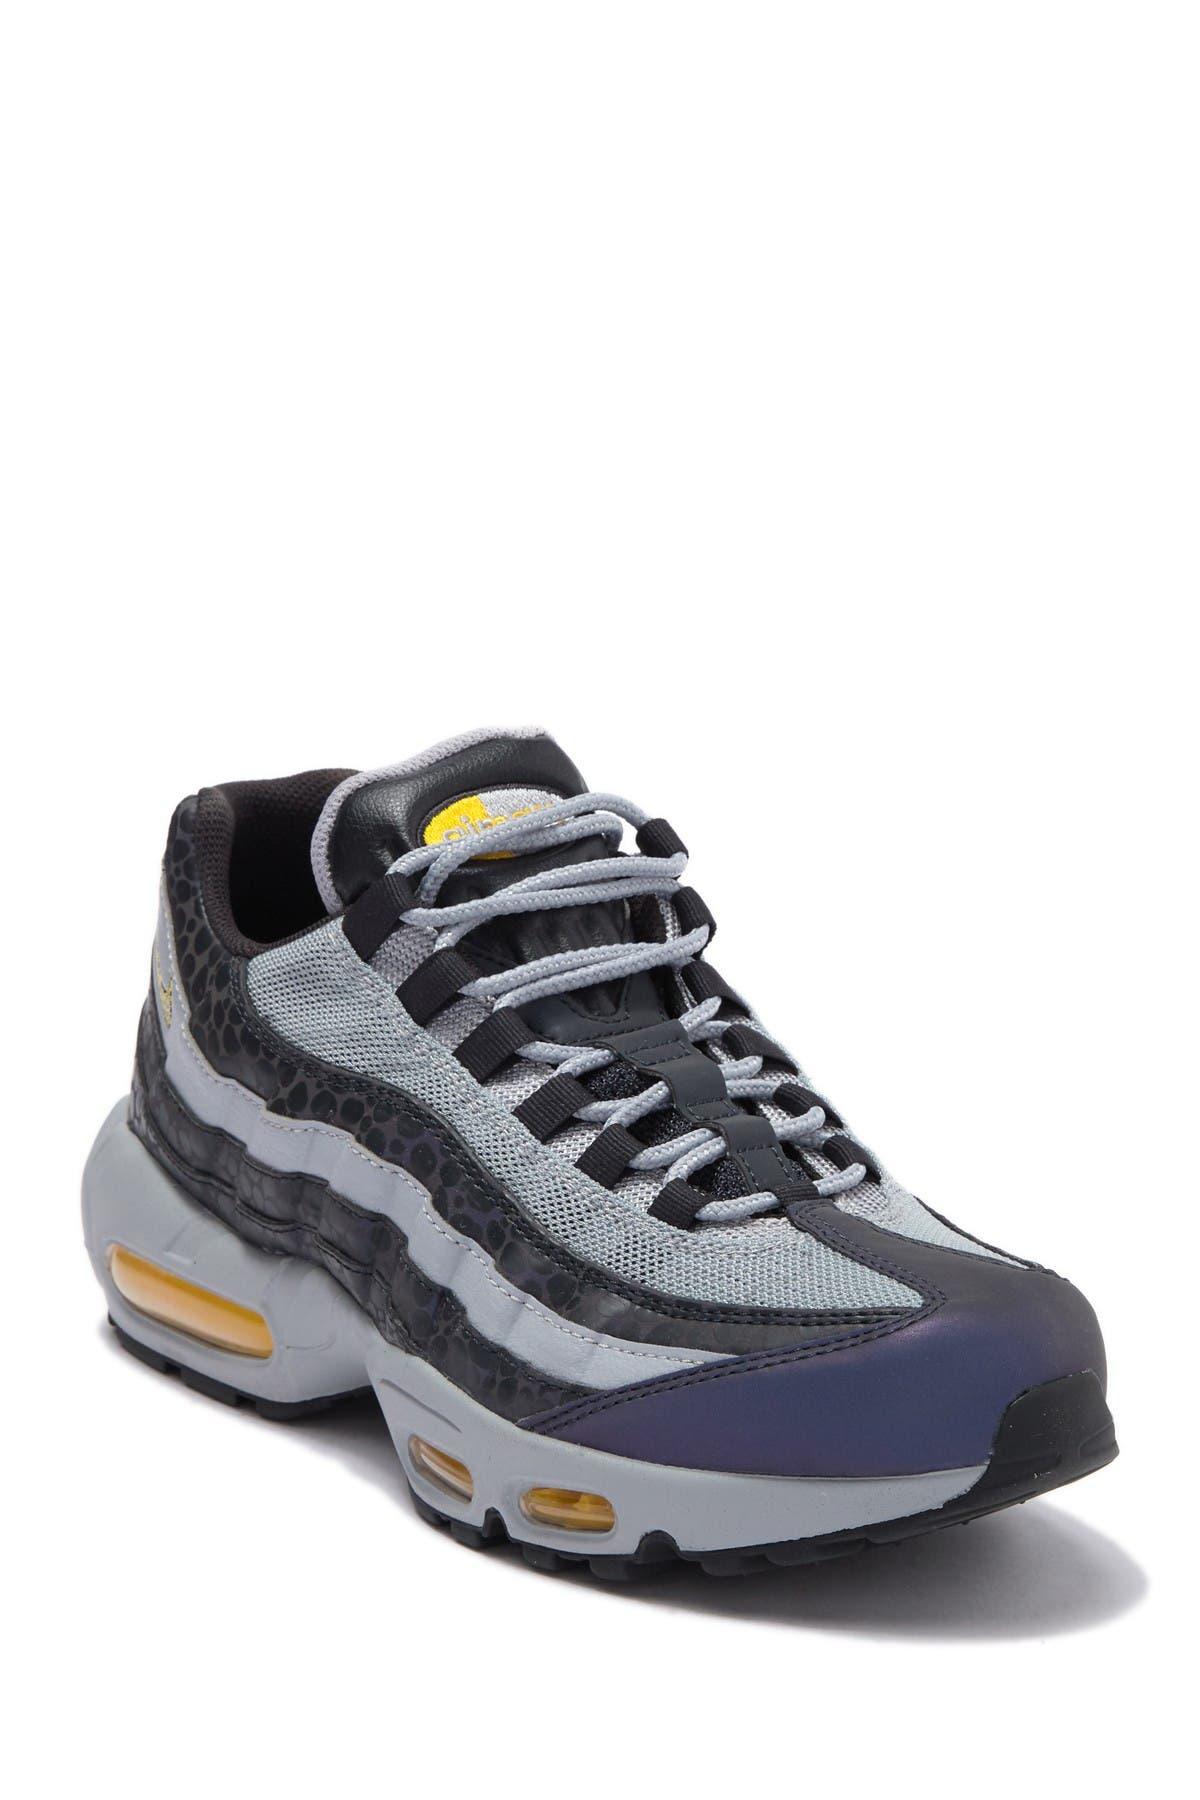 Nike   Air Max 95 SE Reflective Sneaker